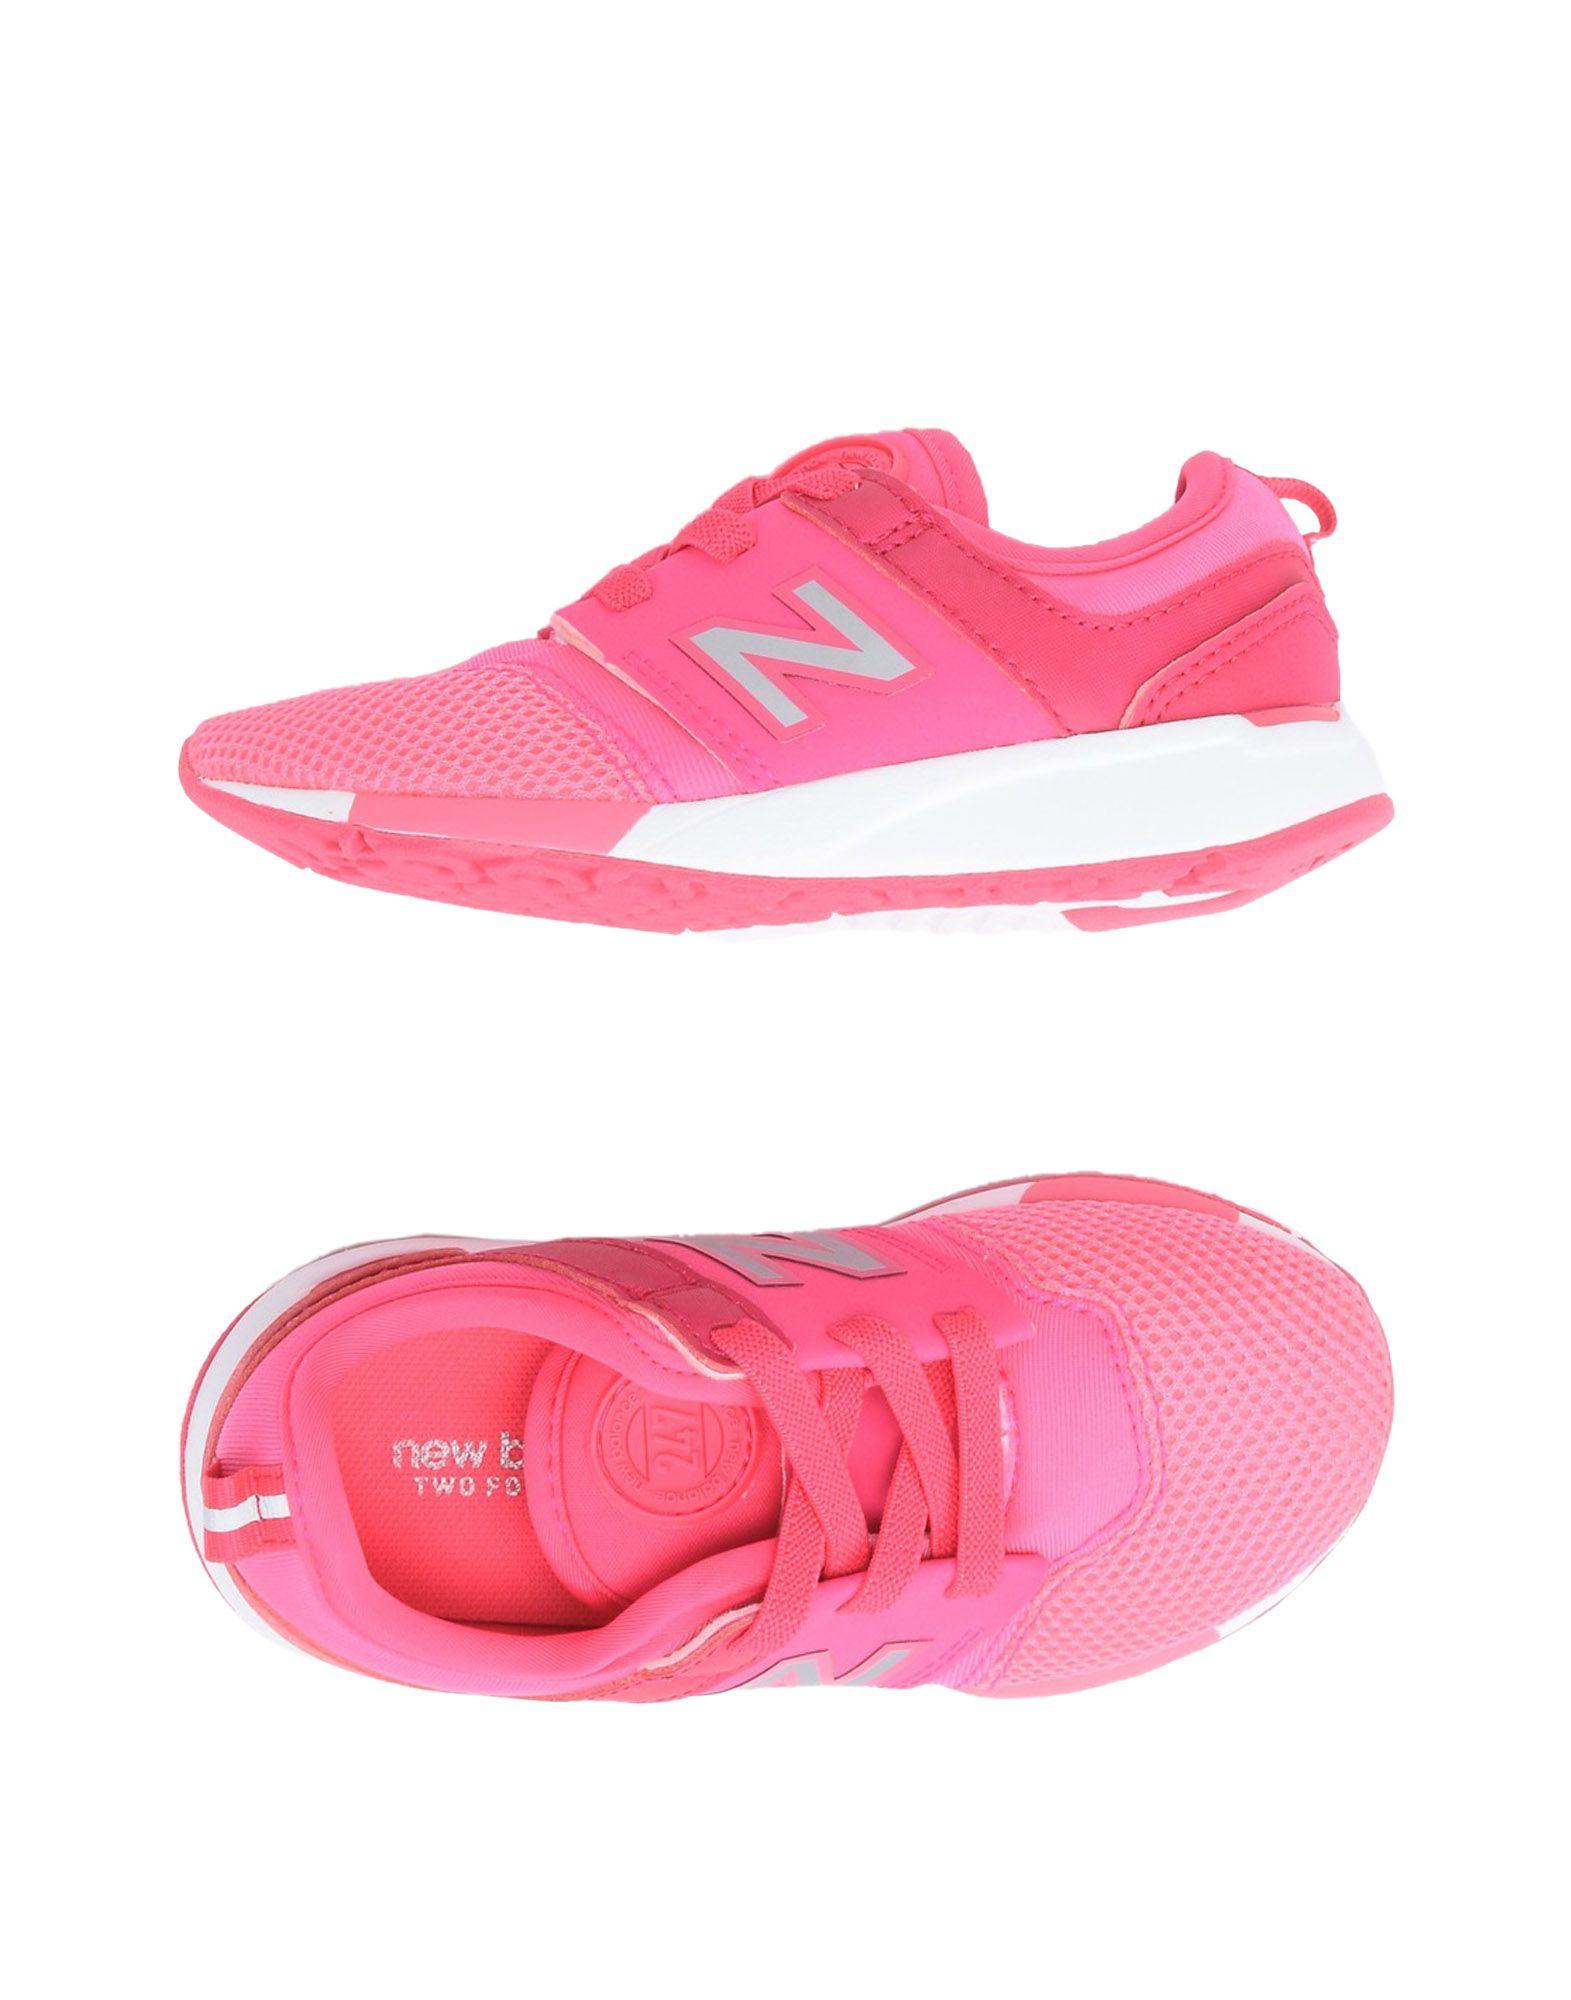 a5a15ef0f1a NEW BALANCE ΠΑΠΟΥΤΣΙΑ Παπούτσια τένις χαμηλά, Παιδικά αθλητικά ...